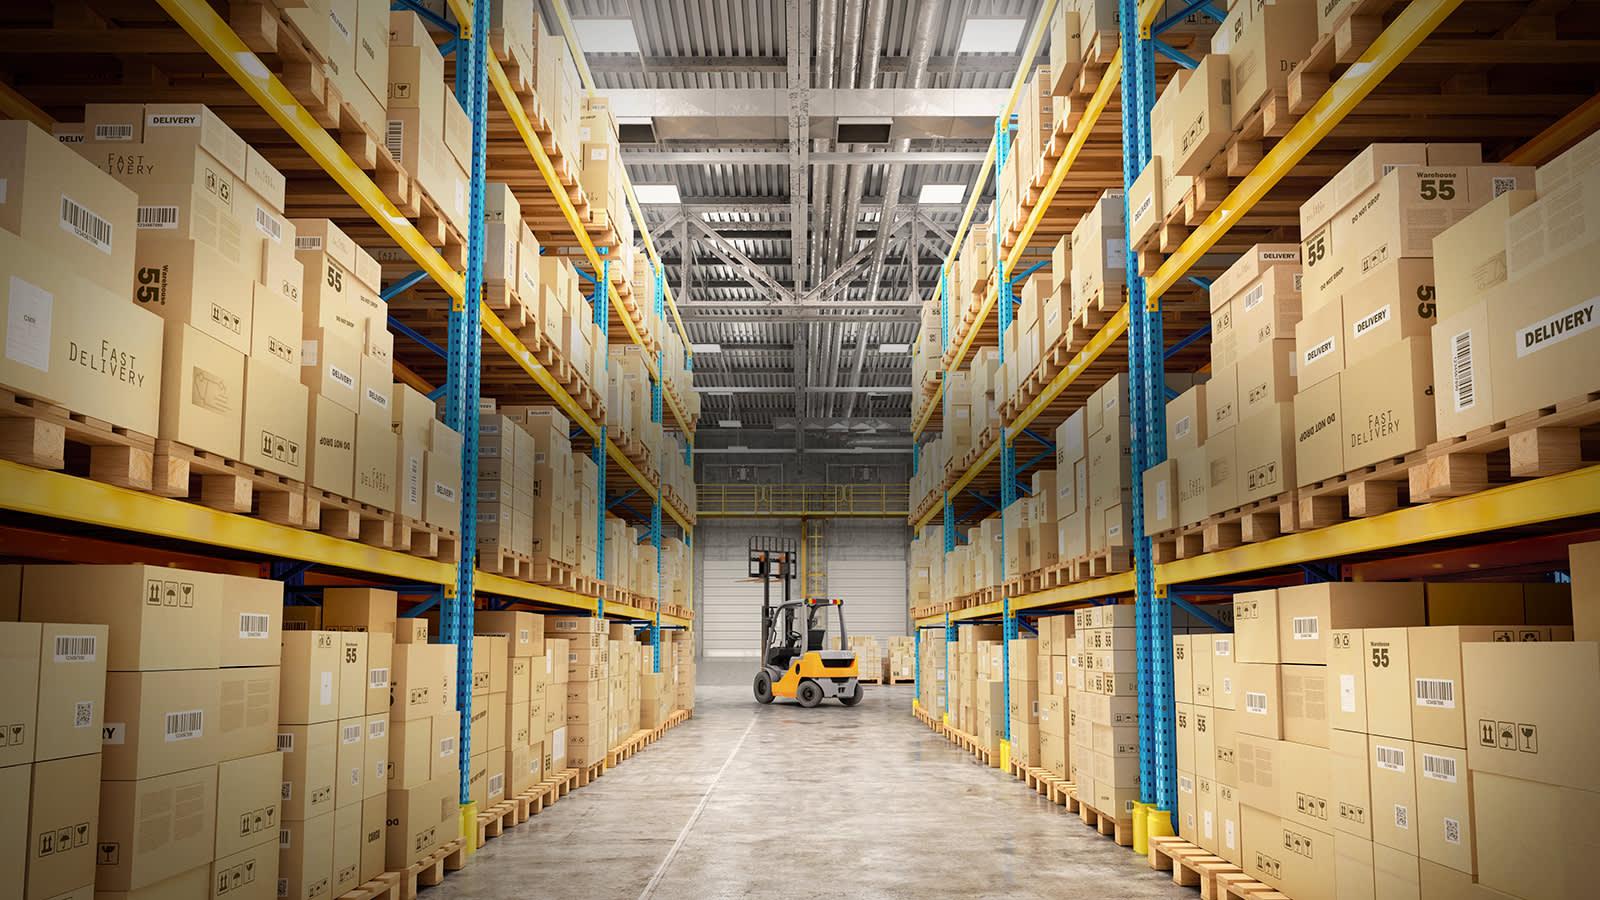 A warehouse